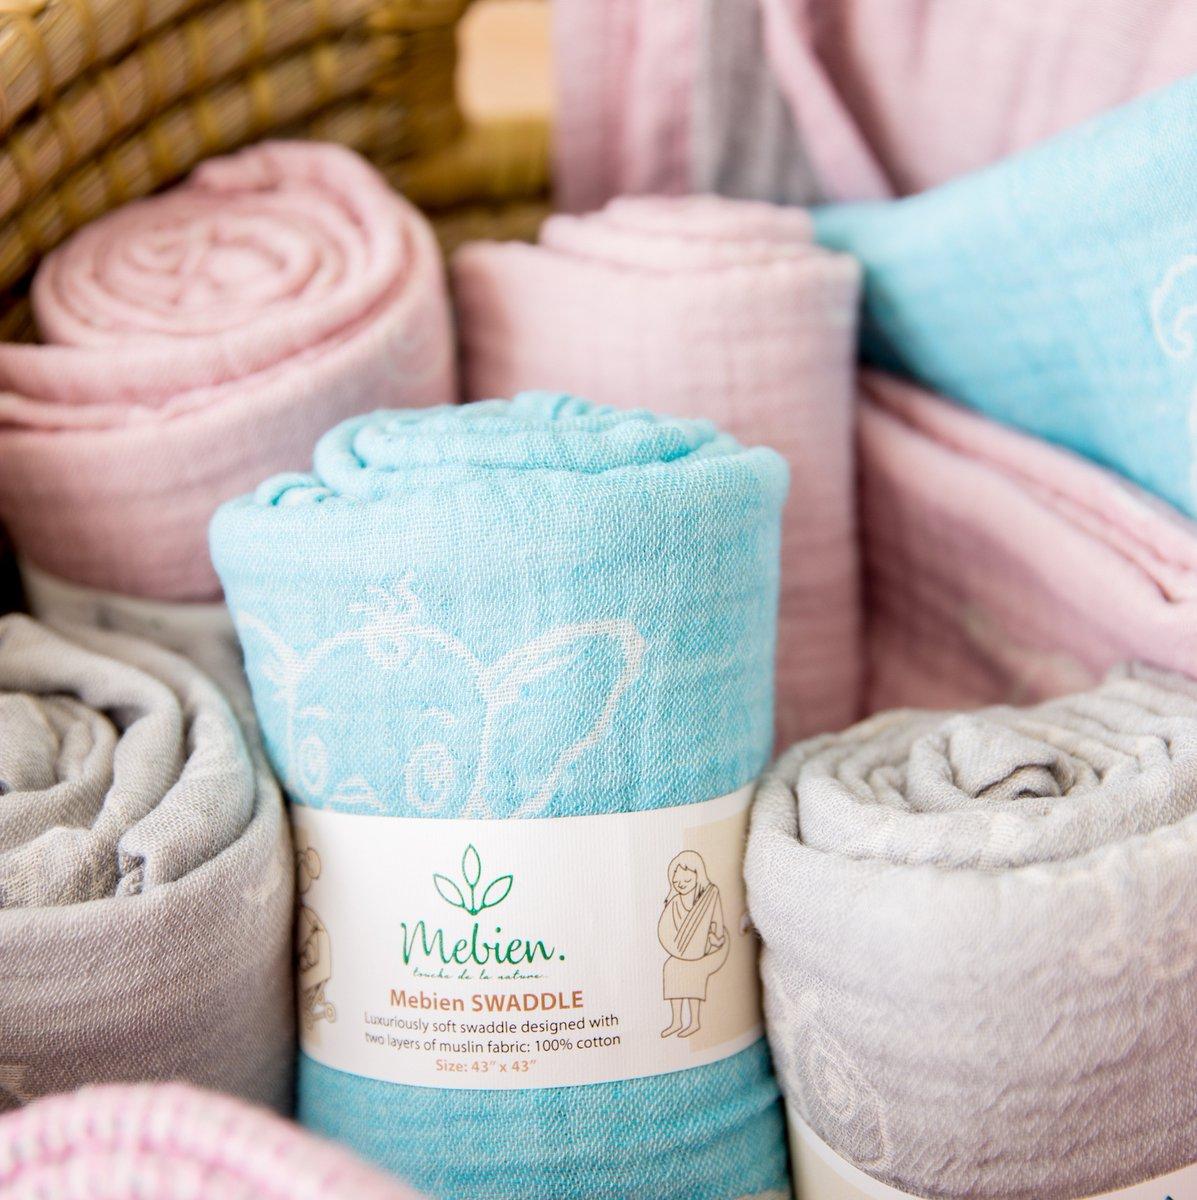 Cotton #mebien #Swaddle on #Amazon #babyswaddle #cottonswaddle #babyblanket #lightblanket #pinkswaddle #blueswaddle #swaddleblanket #swaddlebaby #swaddles #swaddling #baby #babywearing  https://www.amazon.com/s?k=toddler+blanket&me=A3221V797JC5LR&ref=nb_sb_noss…pic.twitter.com/gMikdoCOU9